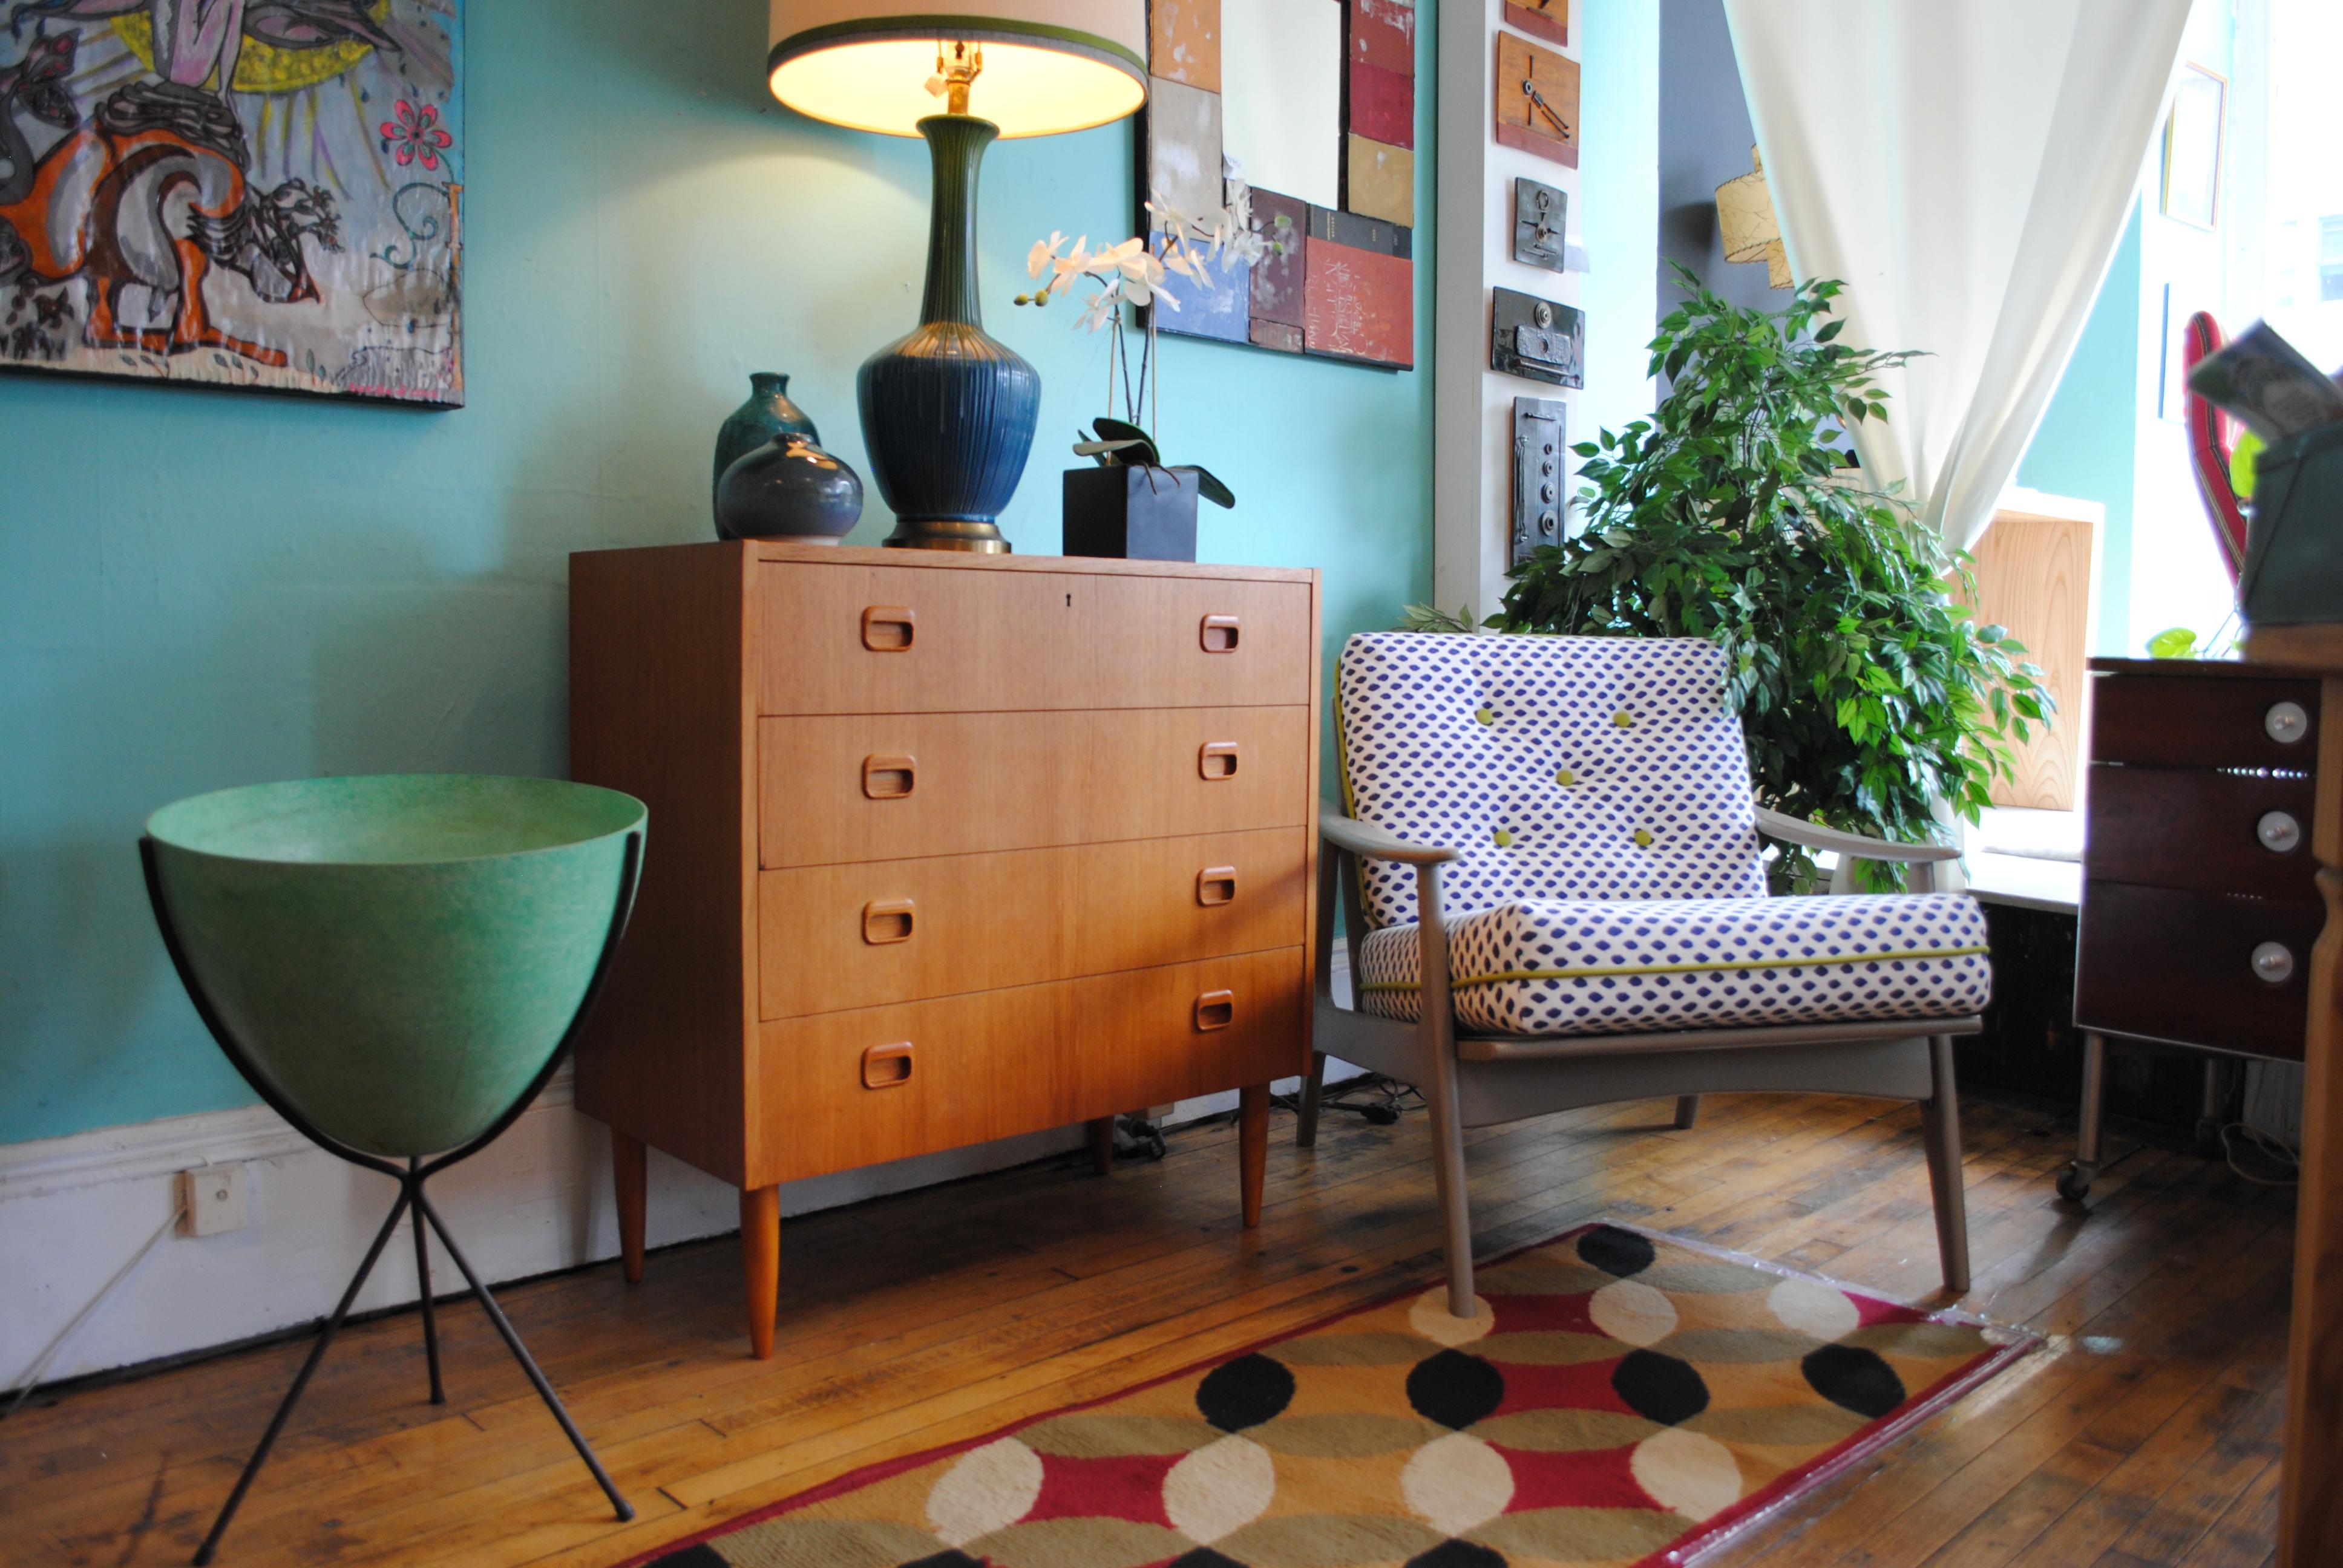 downtown pittsfield western massachusetts the berkshires  circa  -  modern home furnishings) dsc